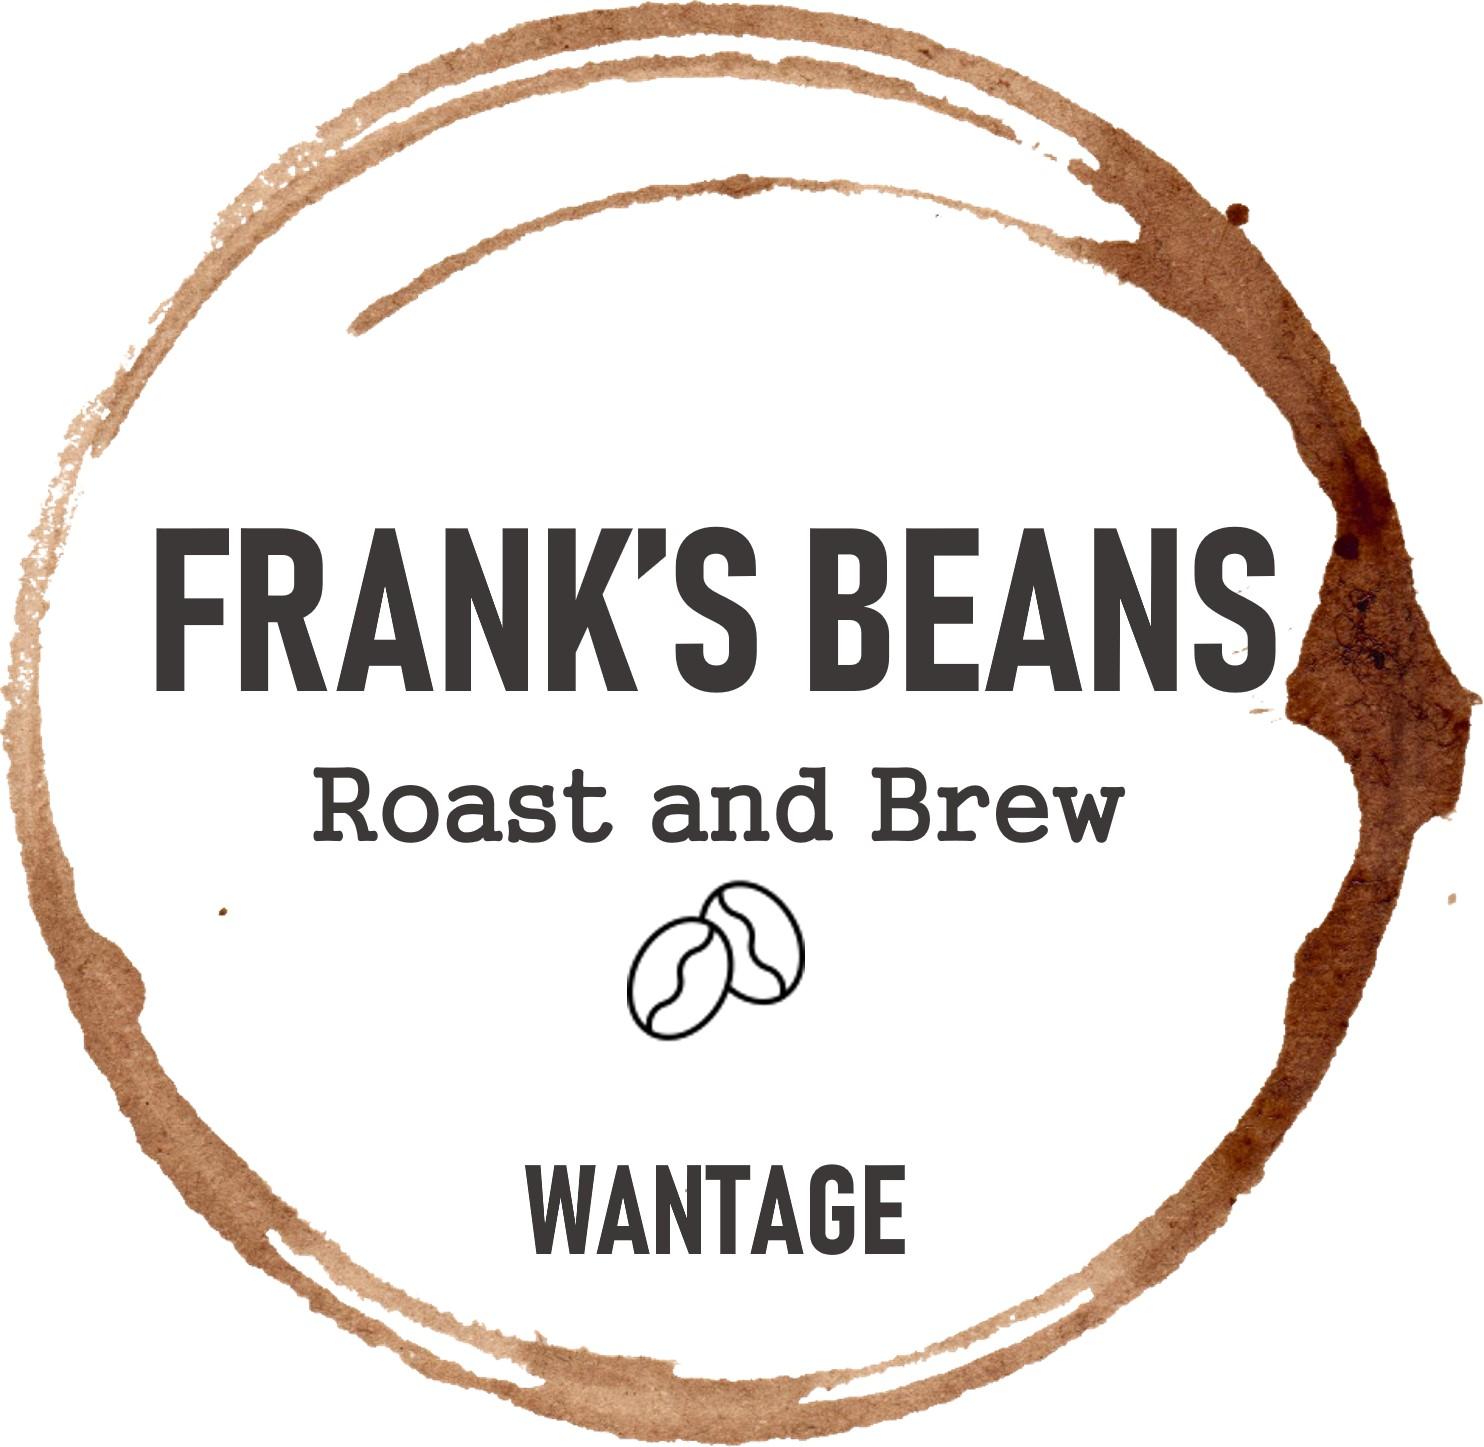 Frank's Beans